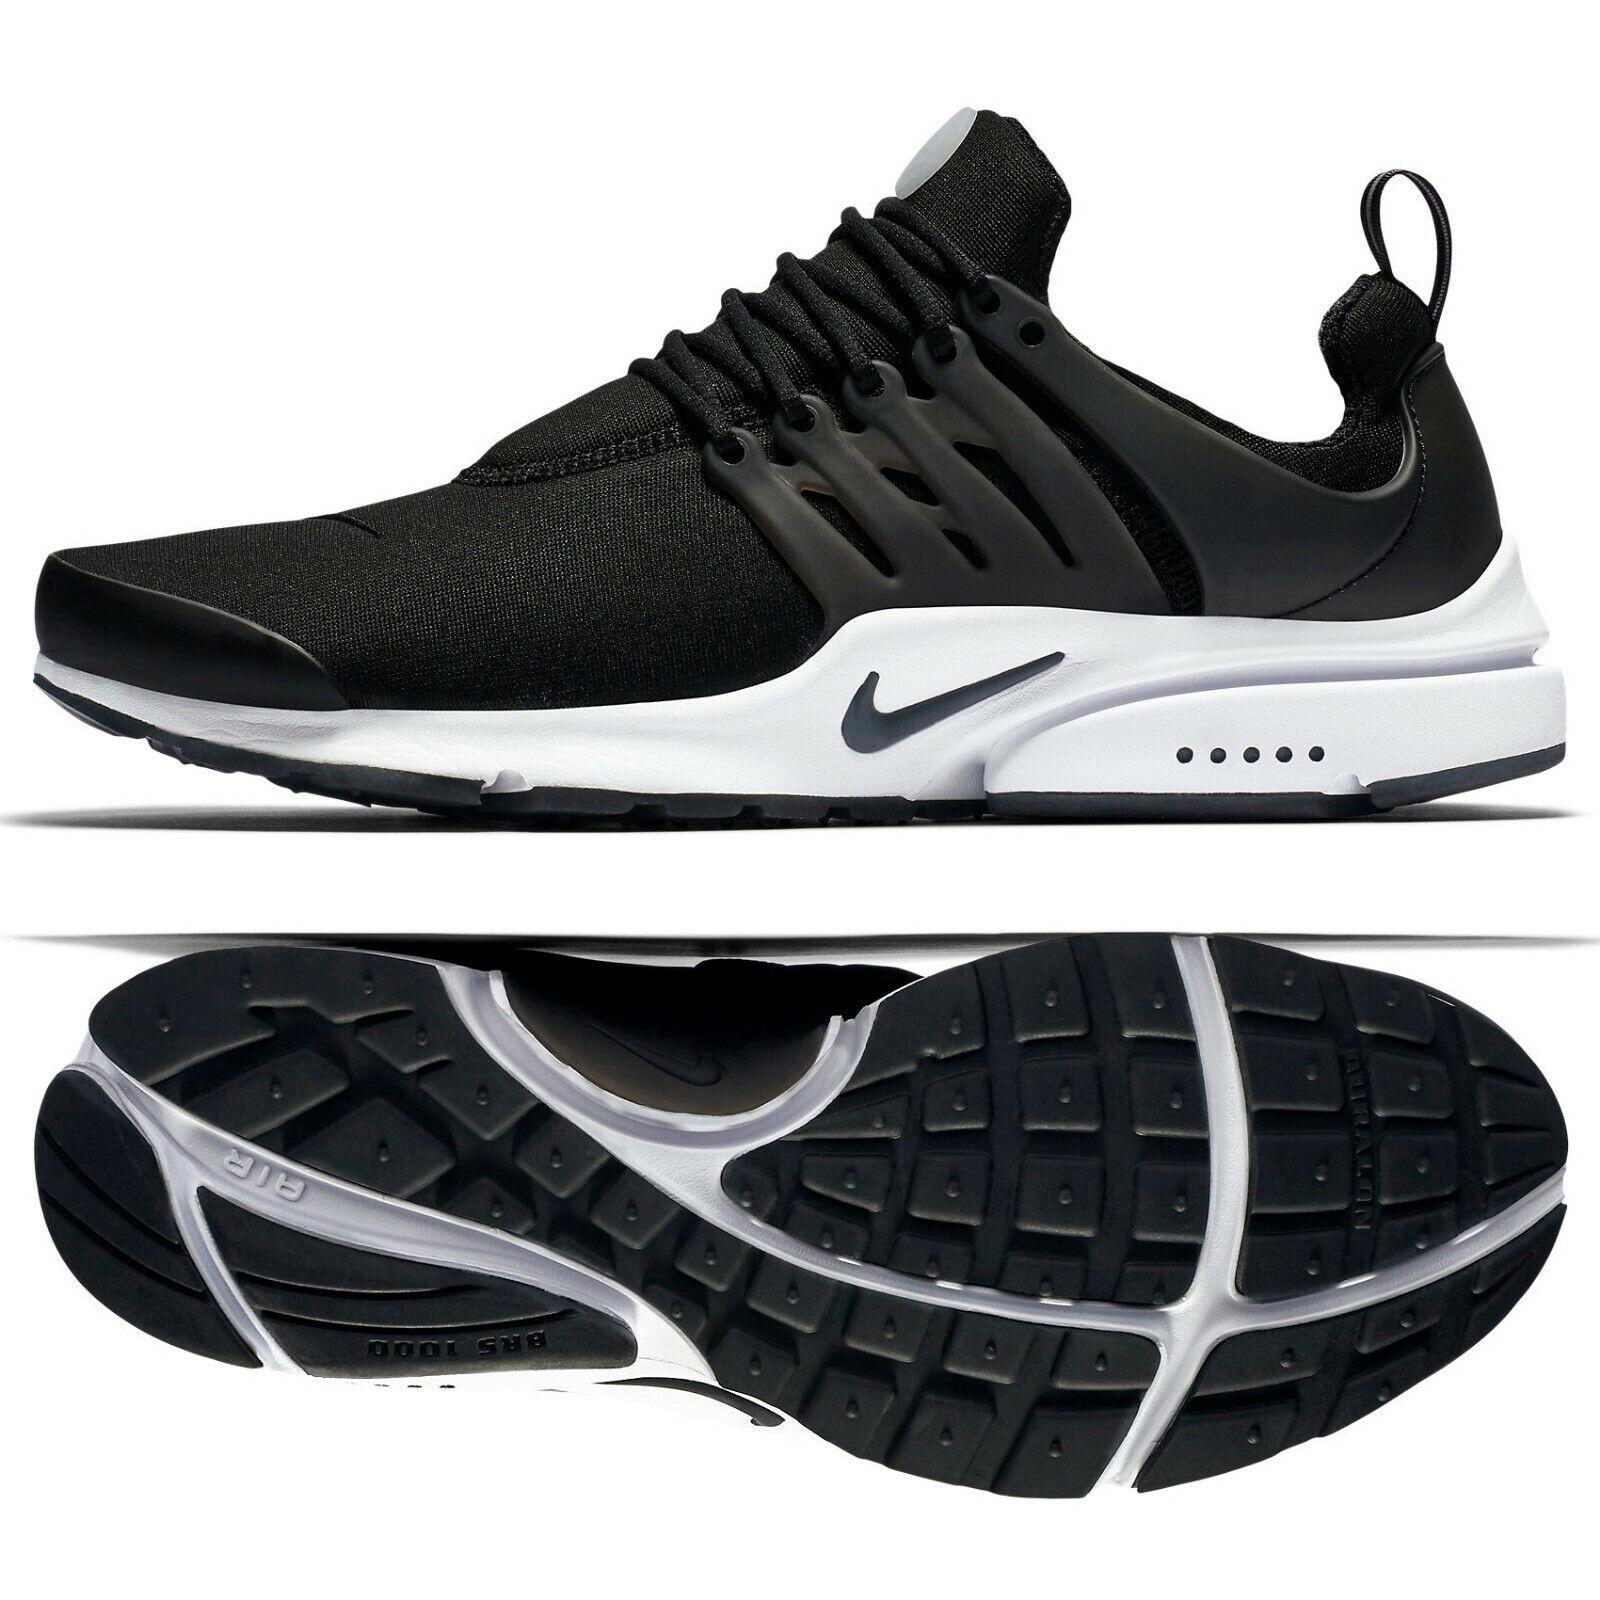 Nike Air Presto Essential 848187-009 Black White Black Men's shoes Sz 13